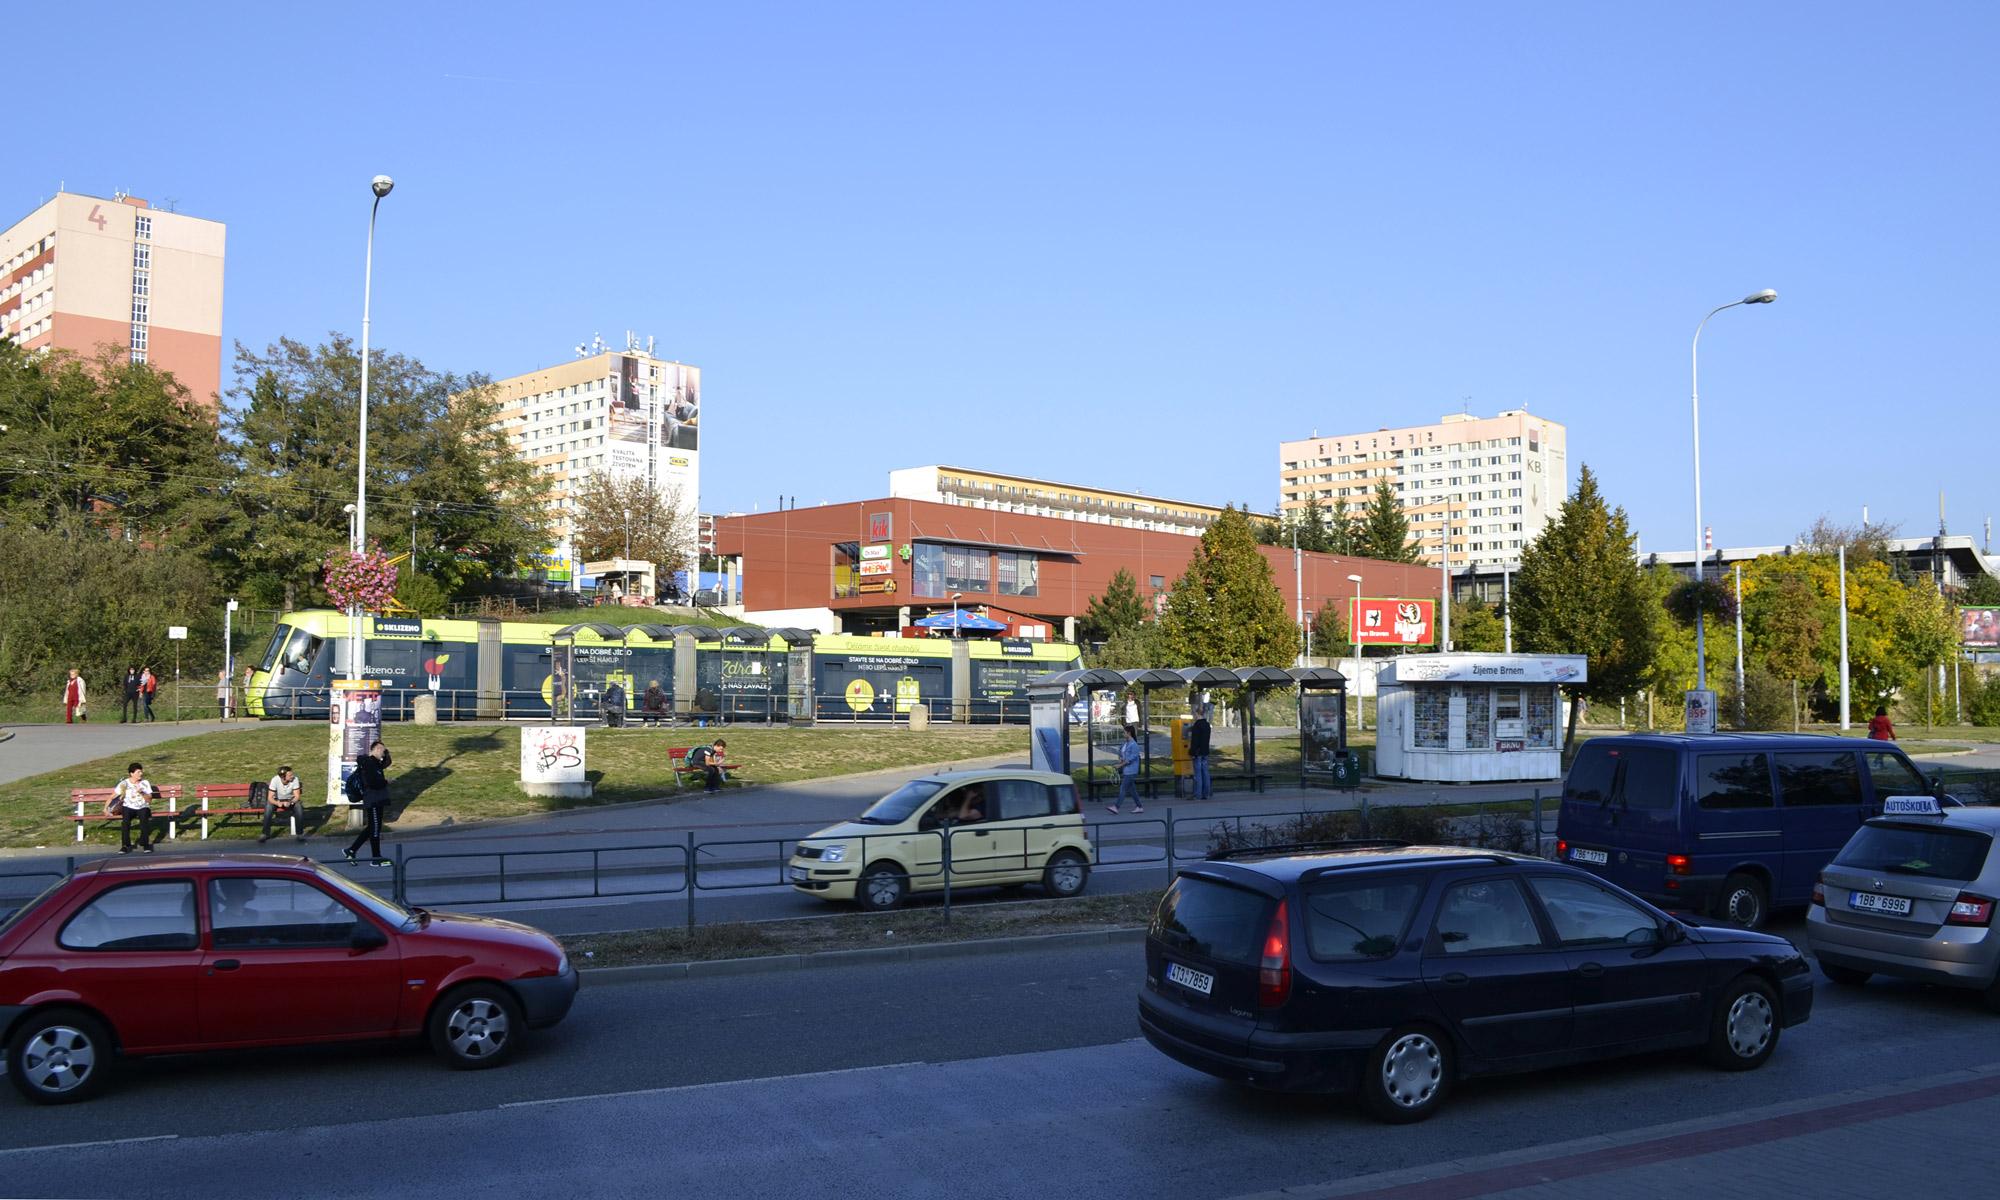 WEREK-MEDIA-Reklamni-plochy-Brno---038ZB-Halasovo-namesti---klient-IKEA---OOH-kampan-10-2018-(8)